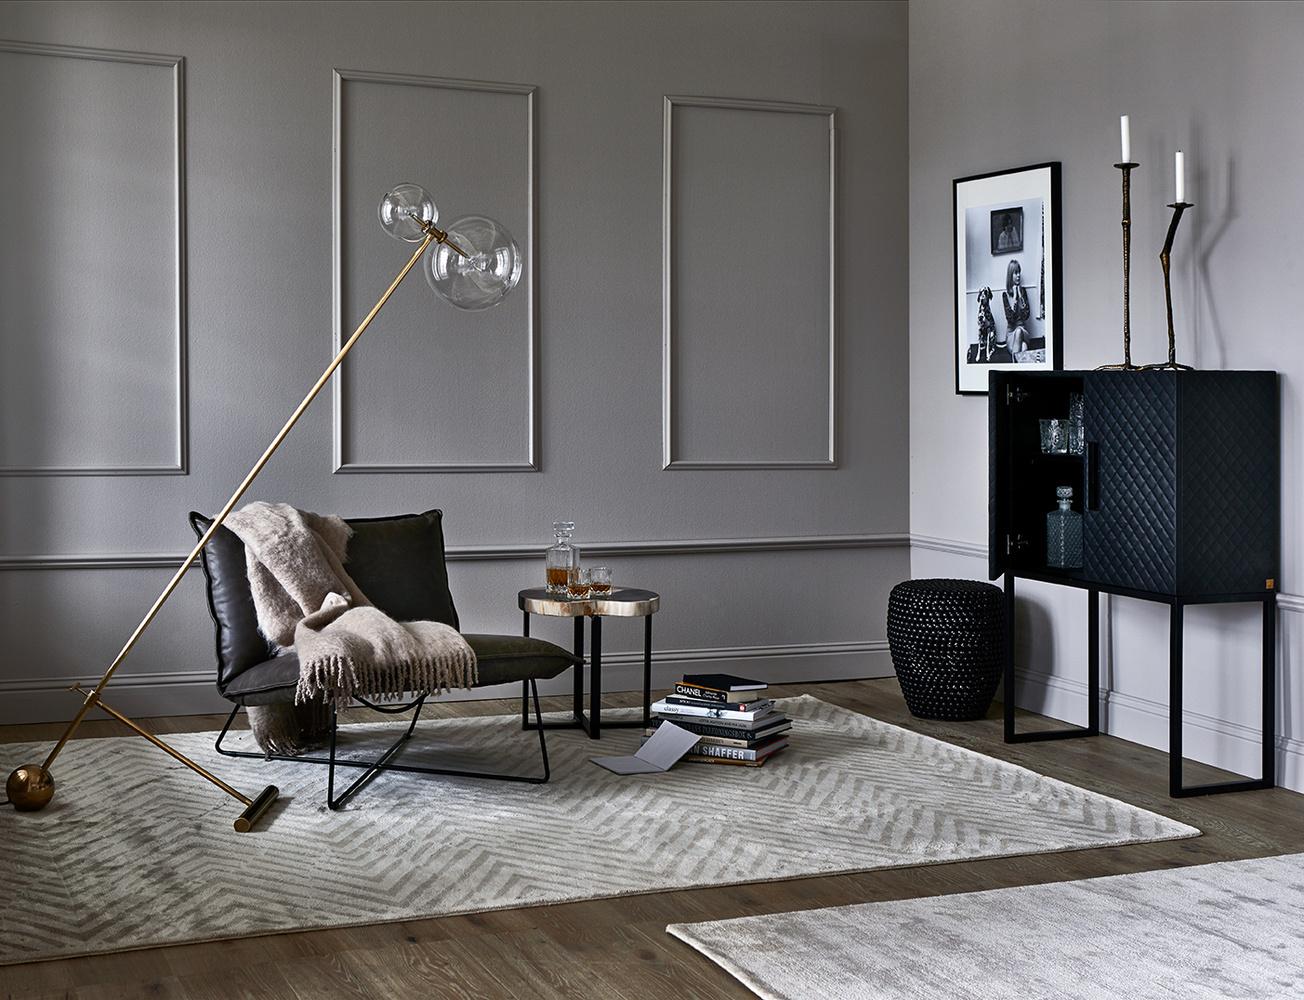 Maison et Objet 2018: Selection of the Rugs best rugs Maison et Objet 2018: Selection of the Best Rugs Maison et Objet Best Rugs 5